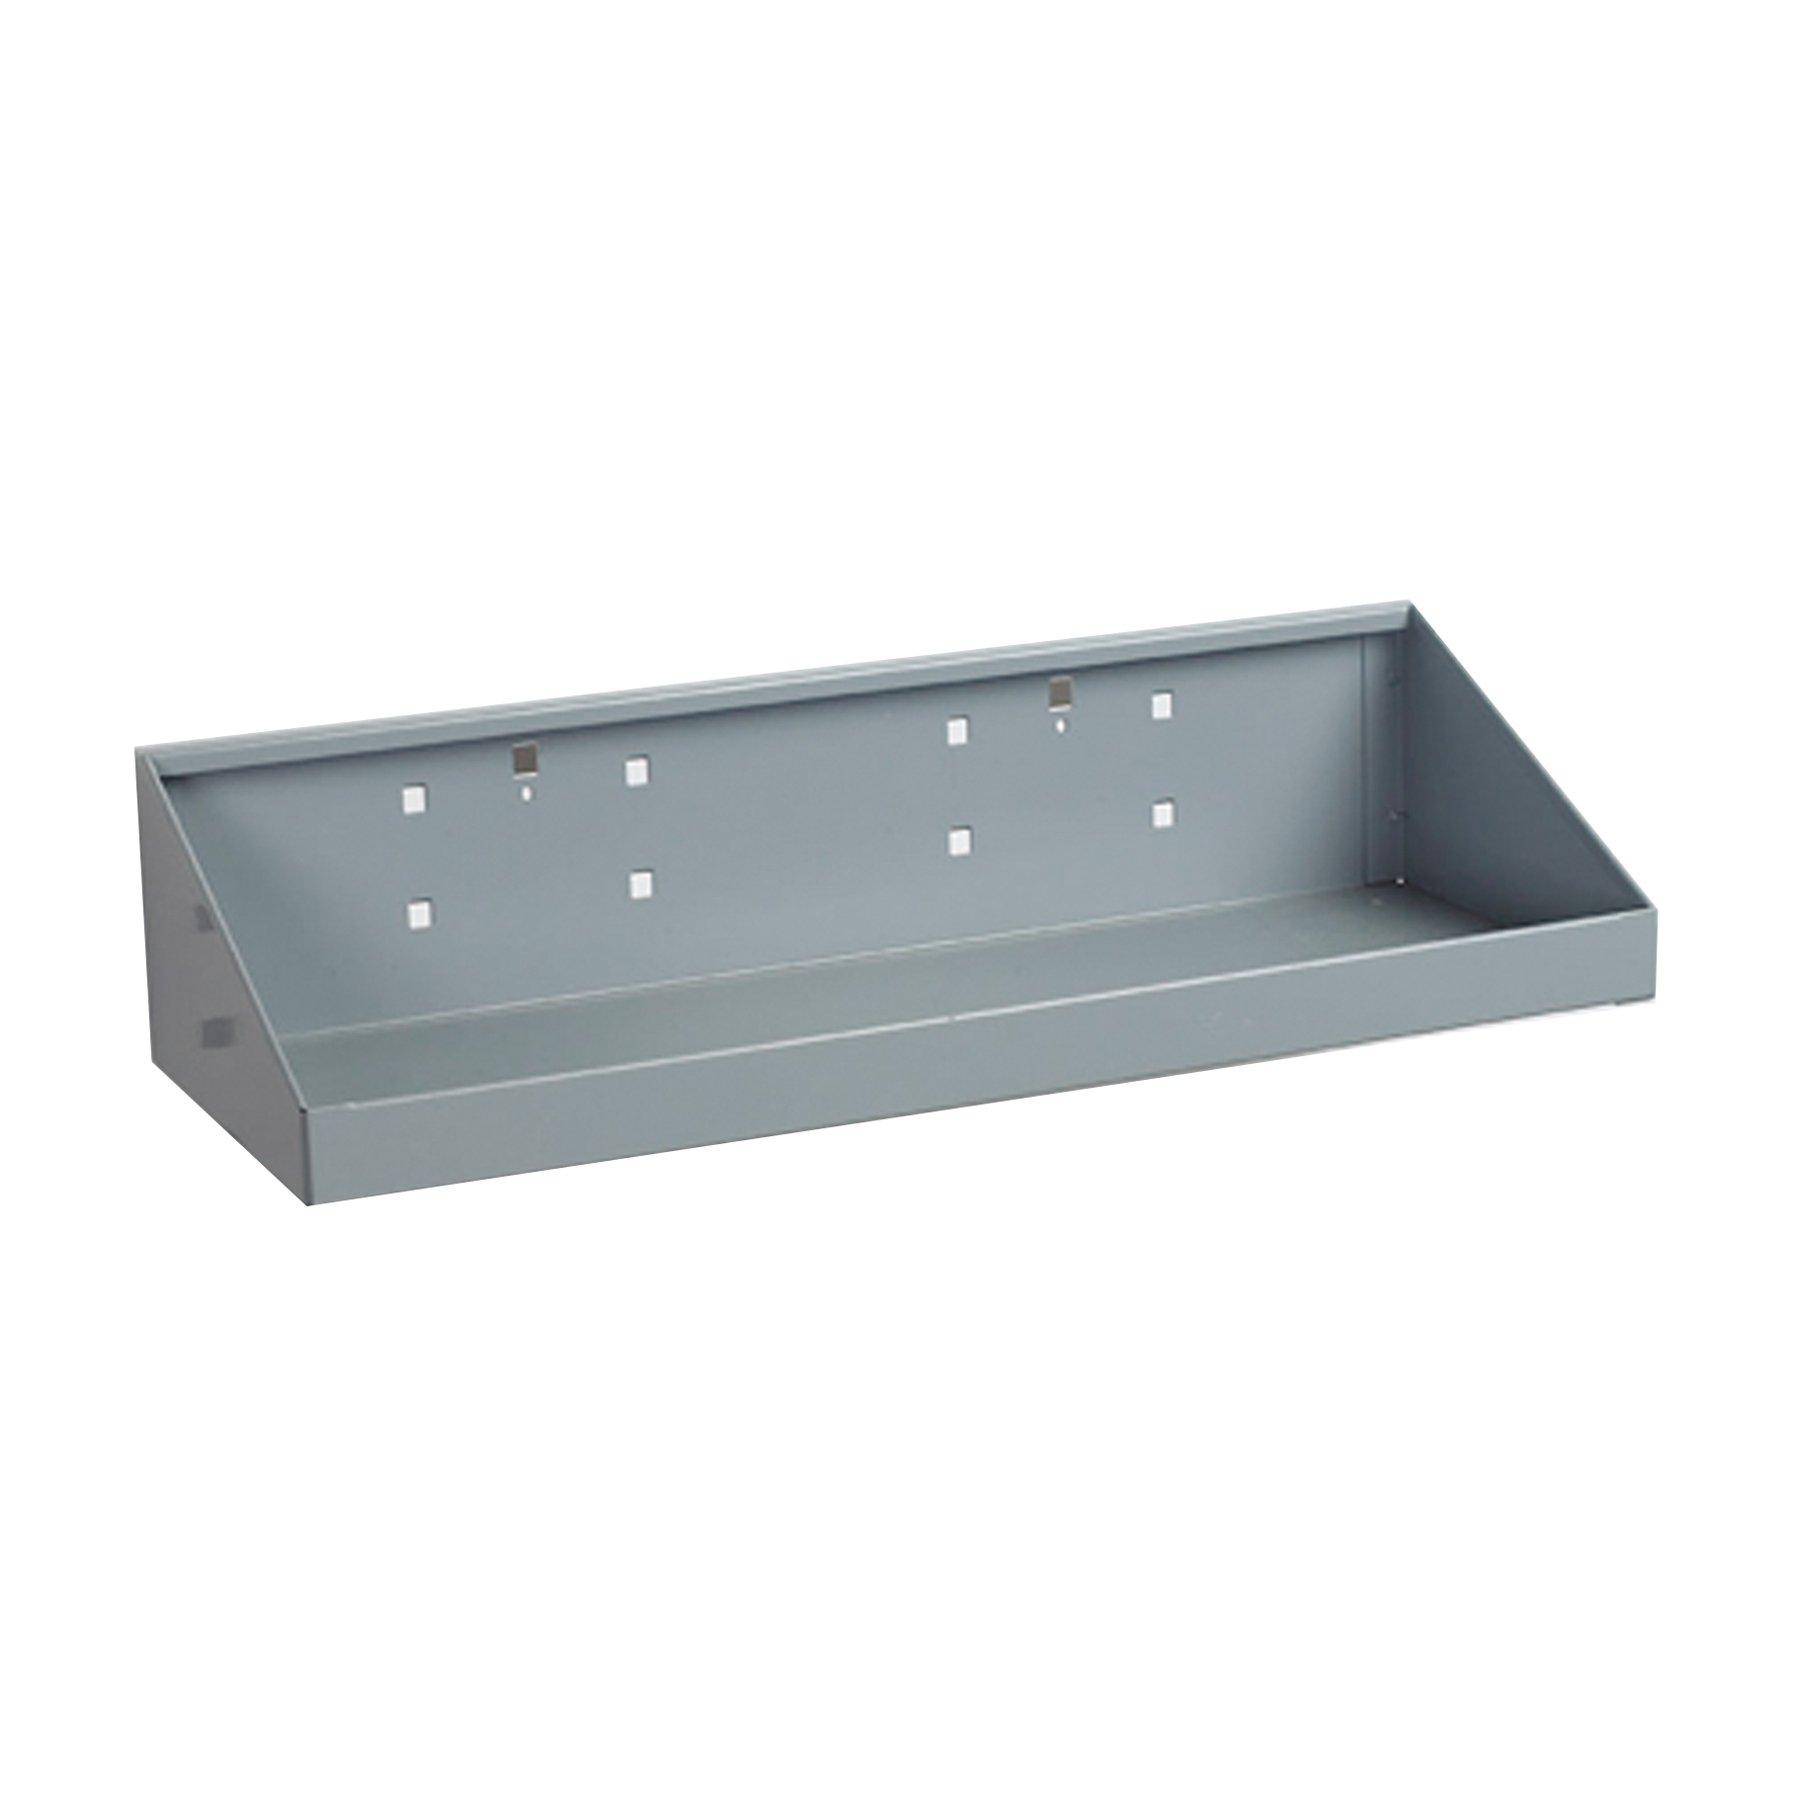 Triton Products 56186 LocHook 18-Inch Width by 6-1/2-Inch Deep Epoxy Powder Coated Shelf for LocBoard, Gray